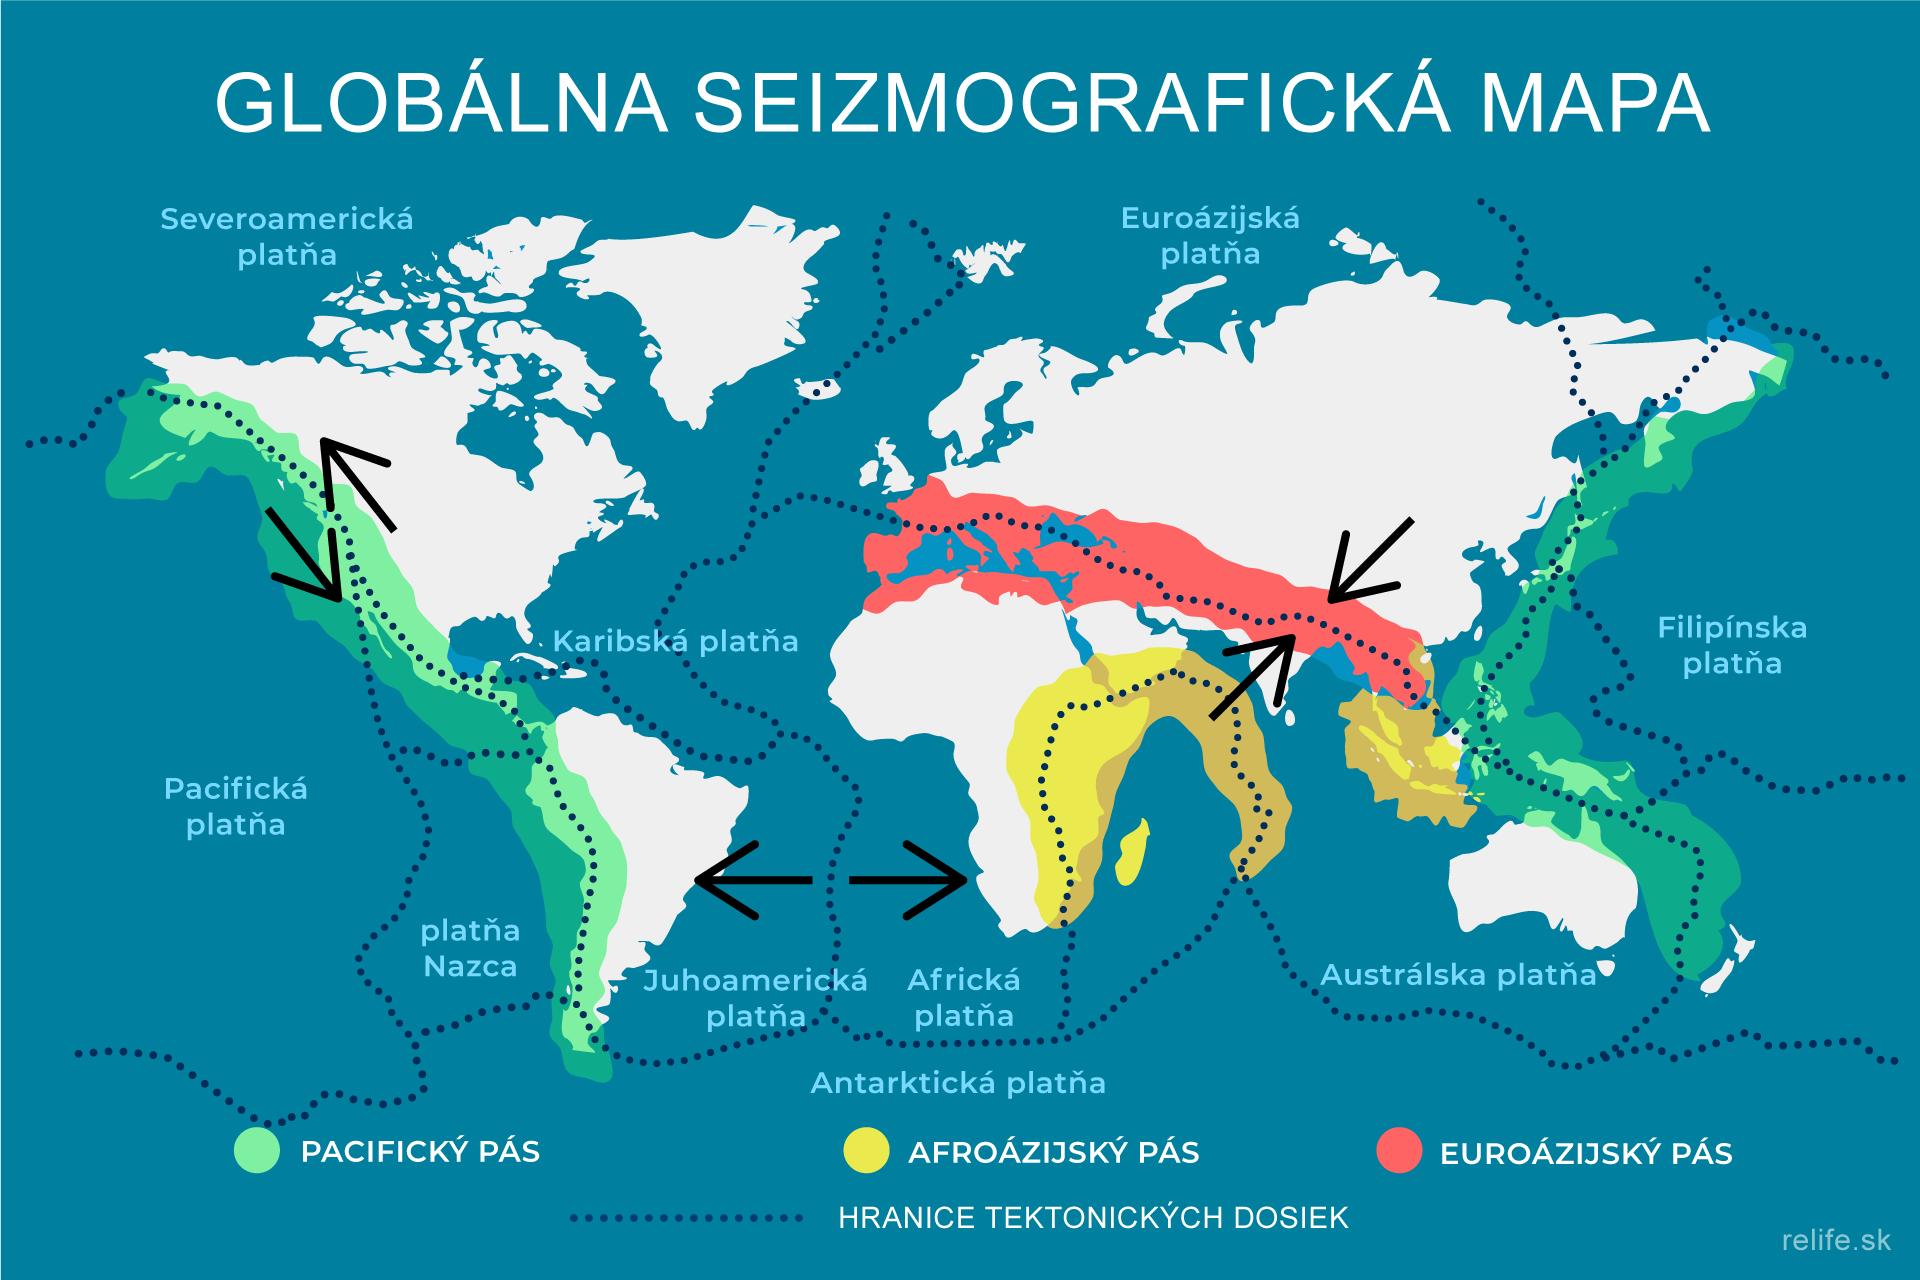 Seizmografická mapa